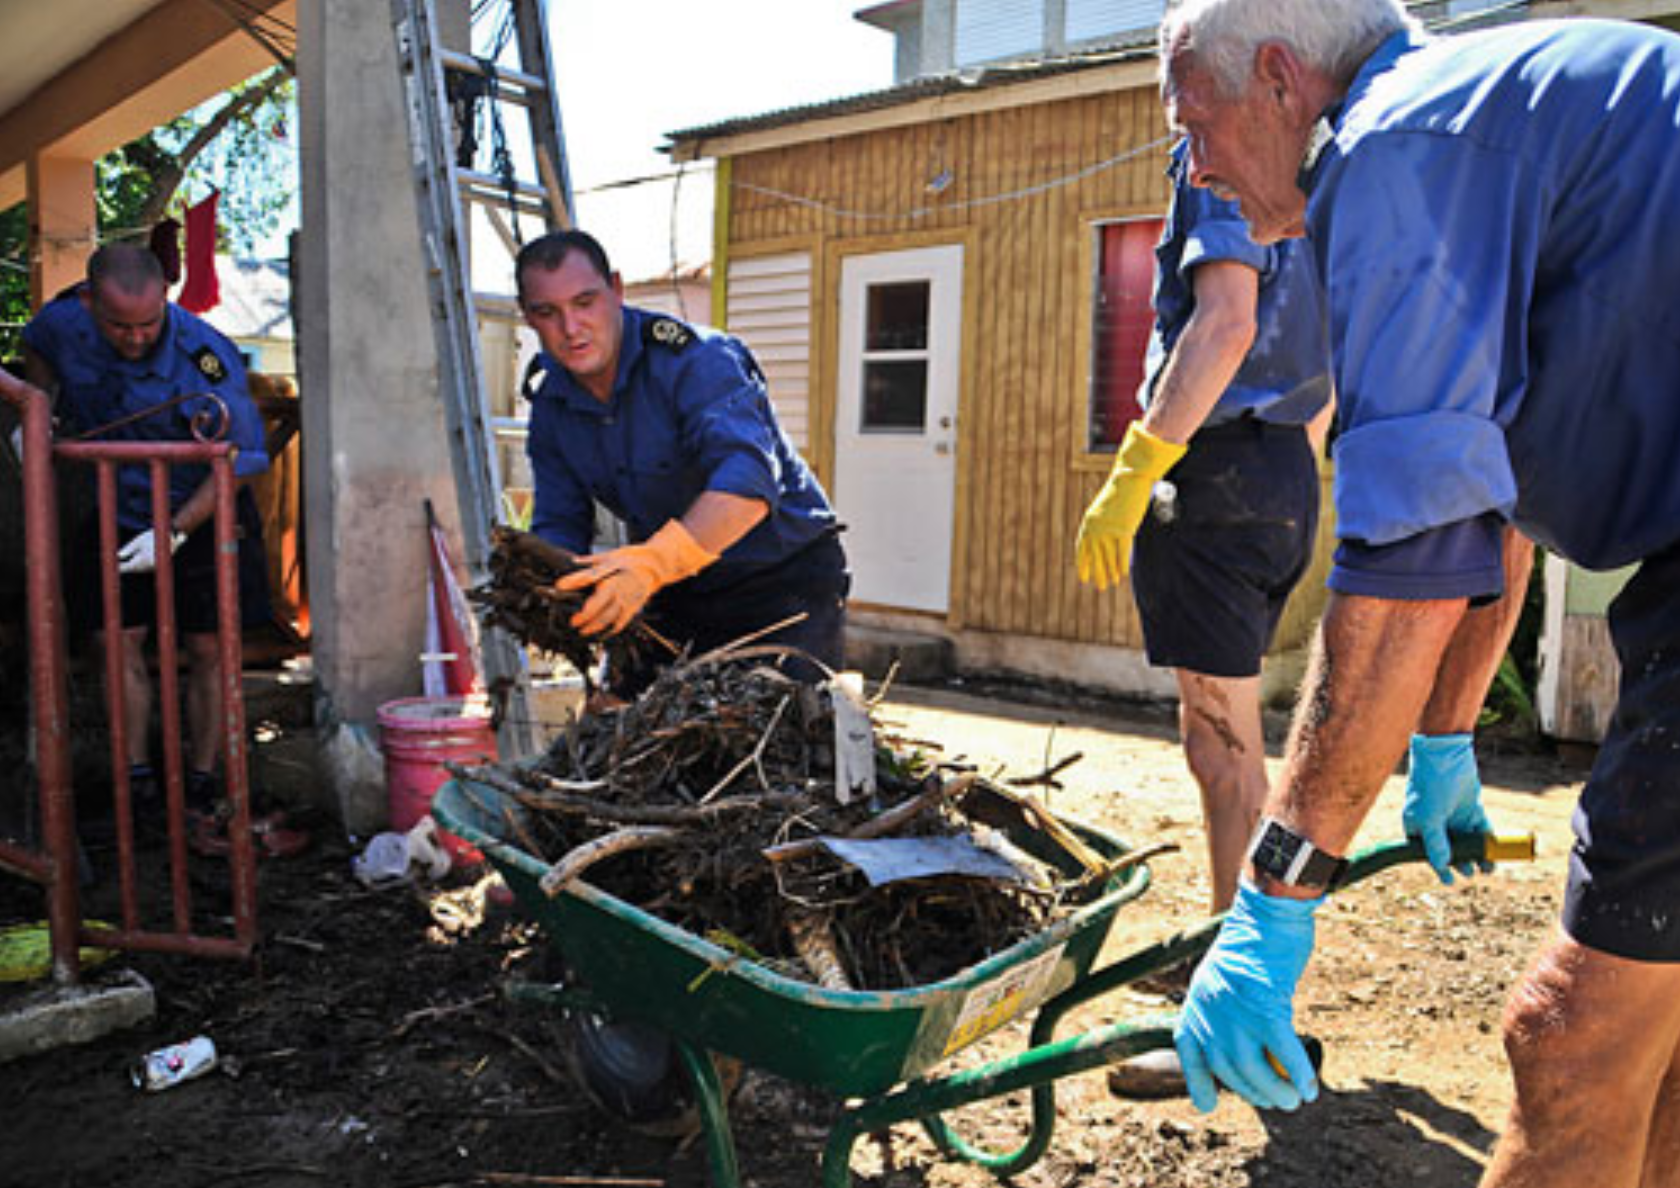 Crew of RFA Wave Ruler helping to clear flood debris, Tortola, British Virgin Islands Credit: Government of British Virgin Islands